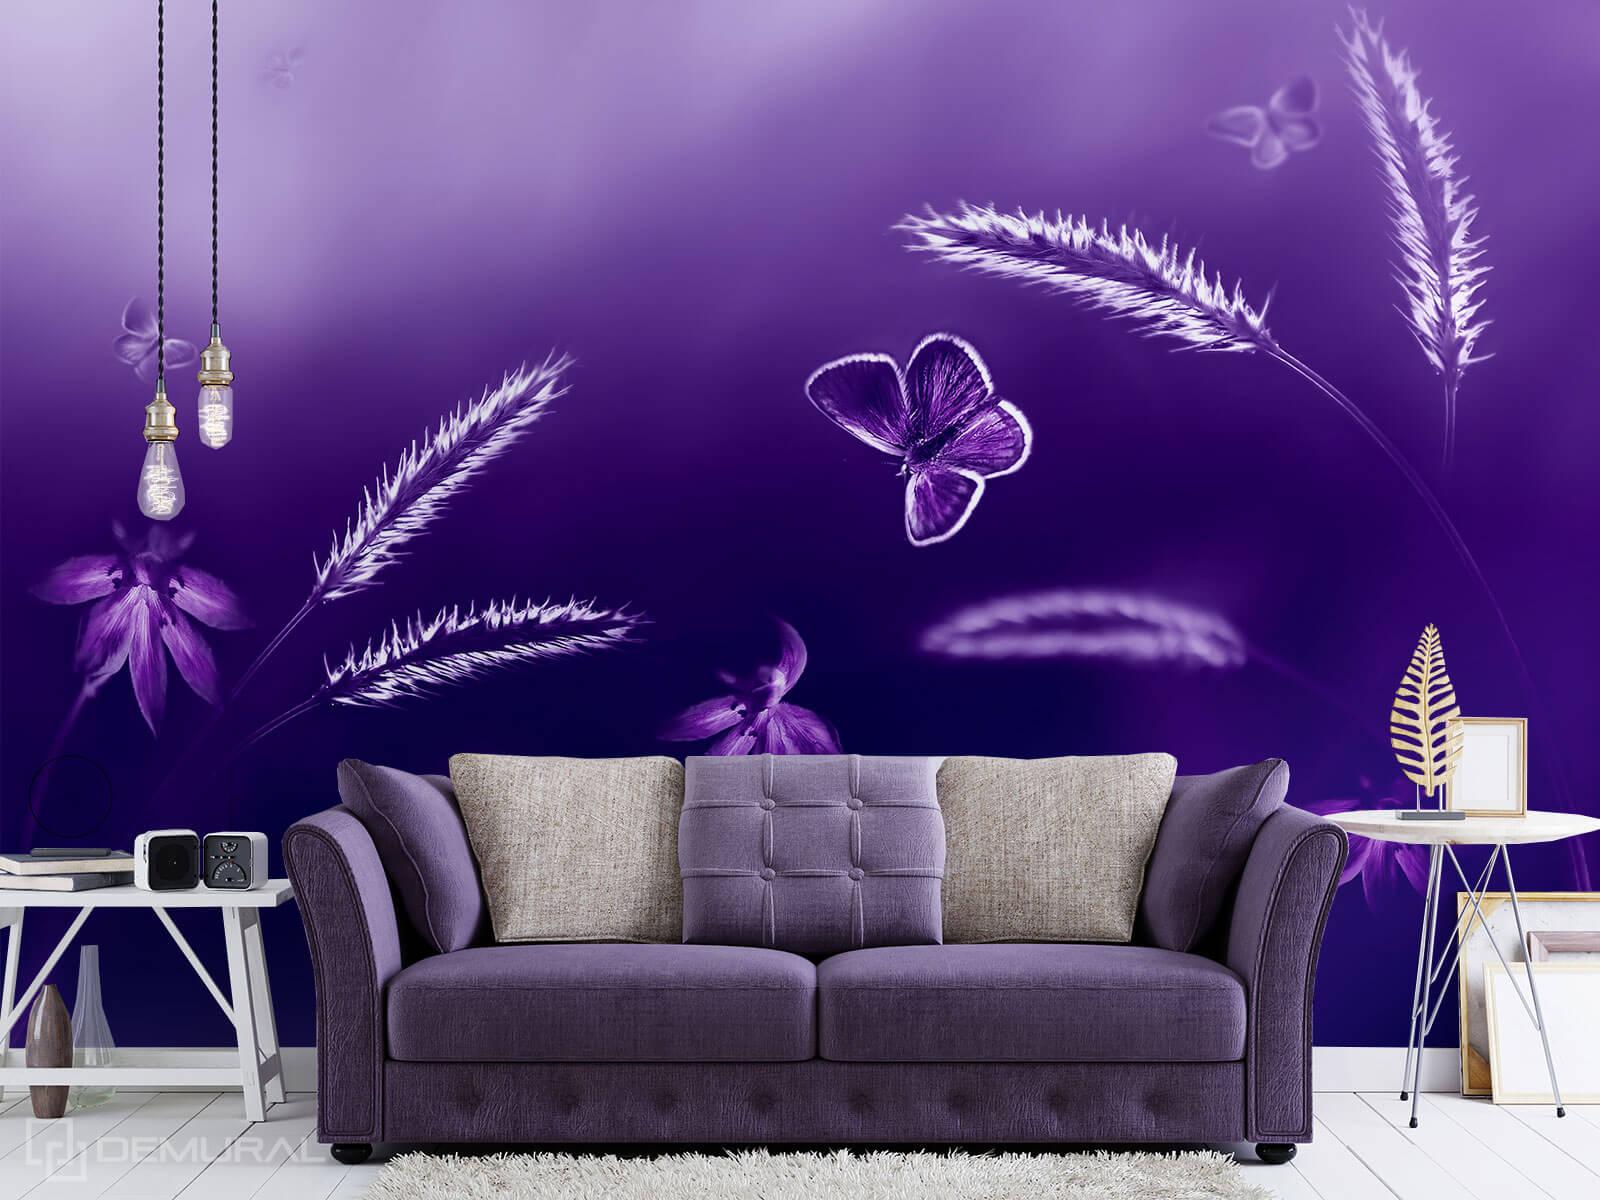 Photo wallpaper Violet meadow - Ultraviolet wallpaper - Demural